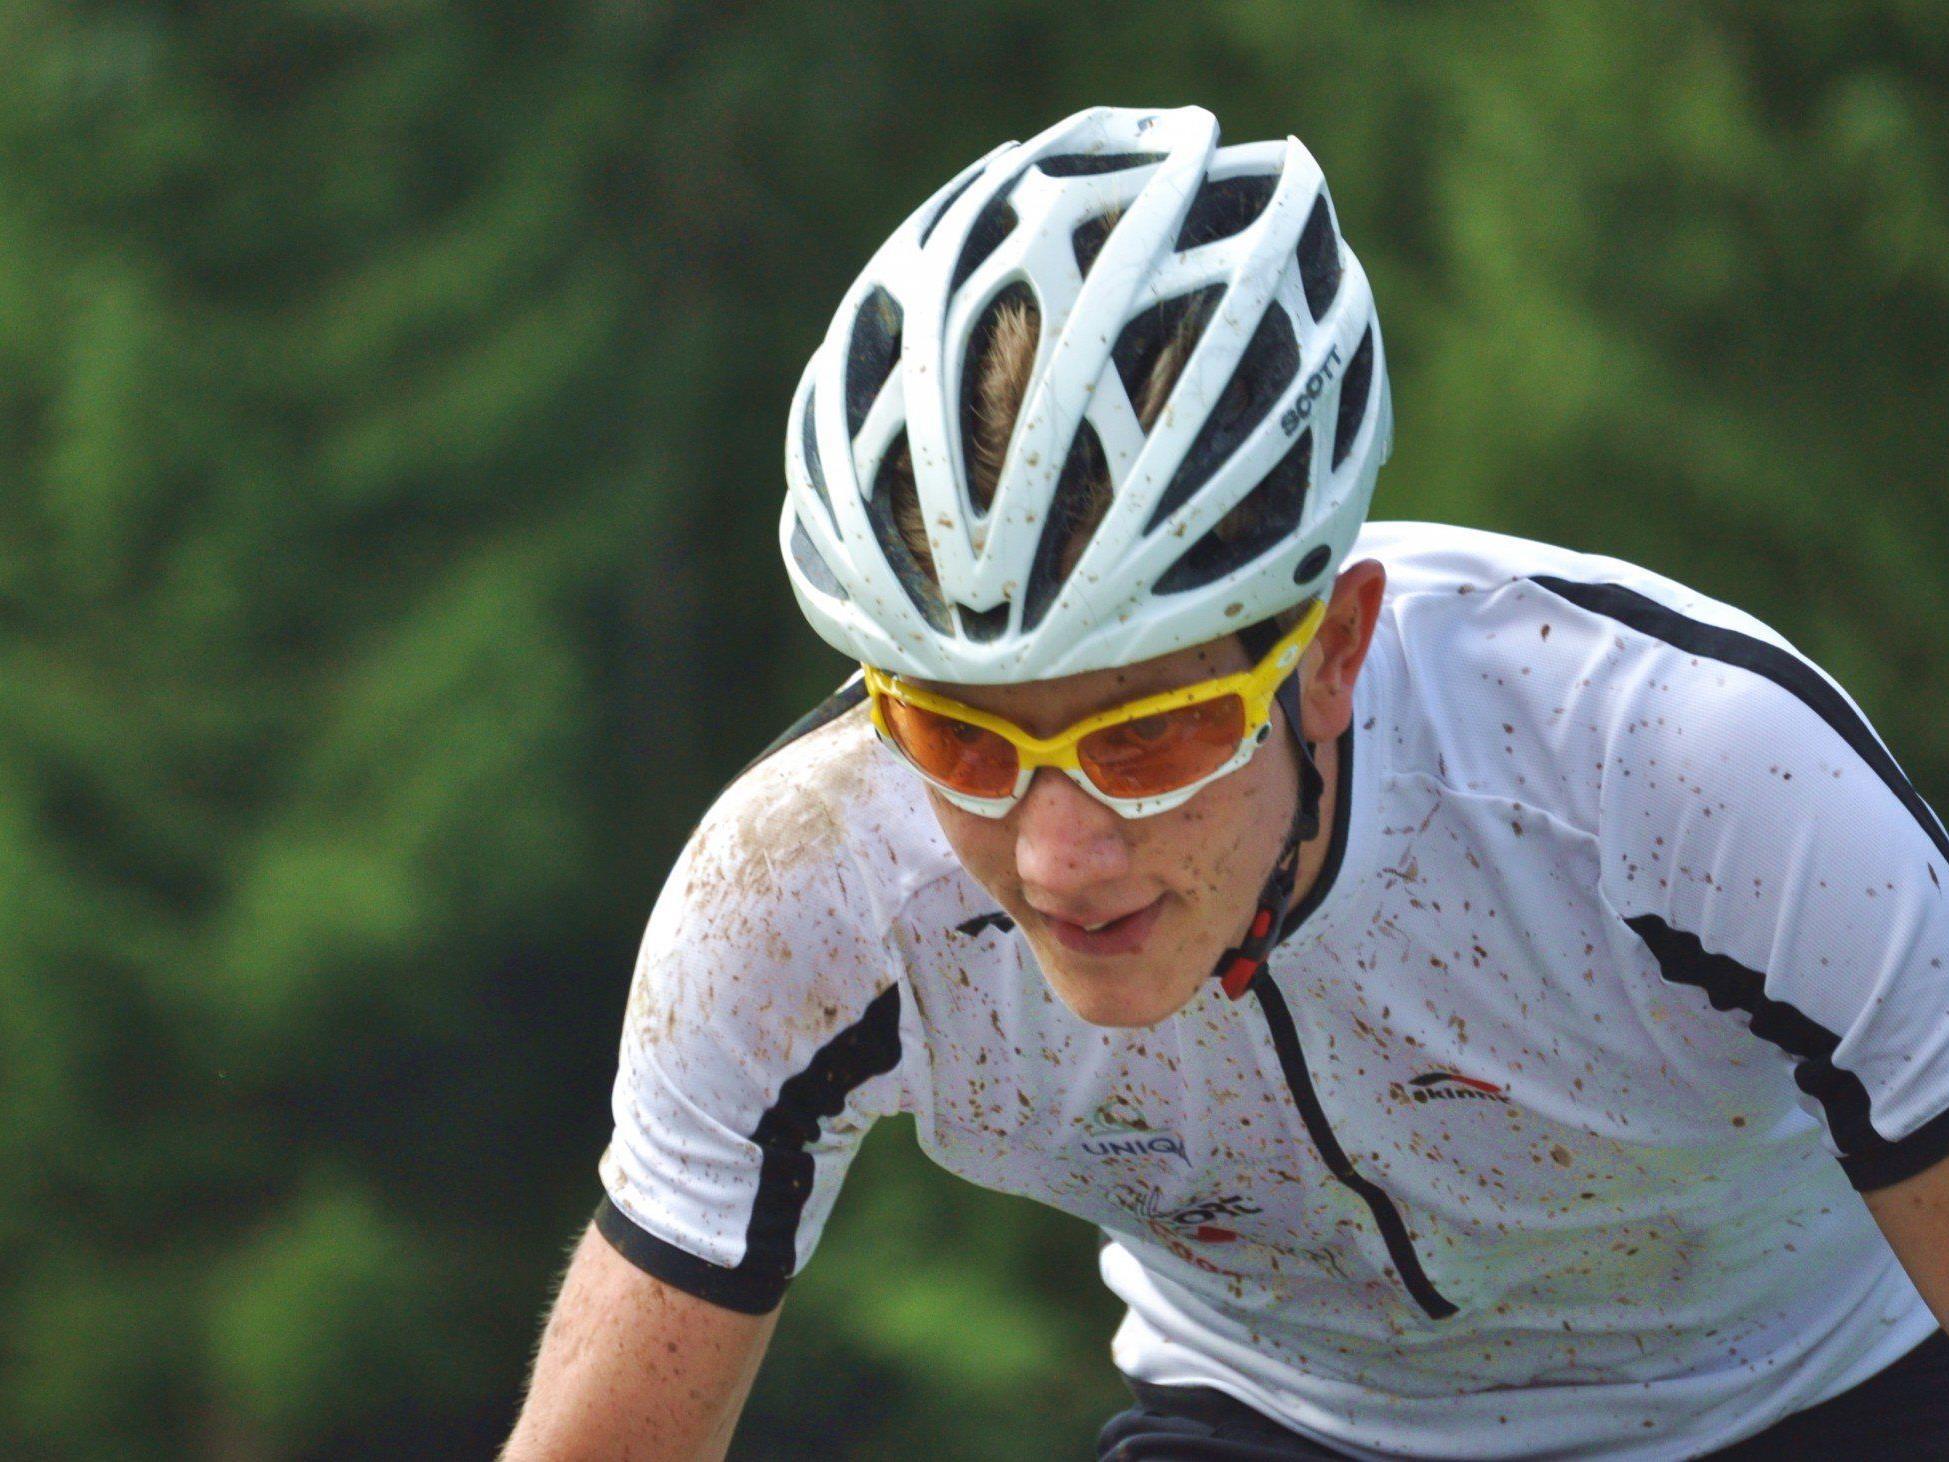 Elias Hagspiel gewinnt in Lindau